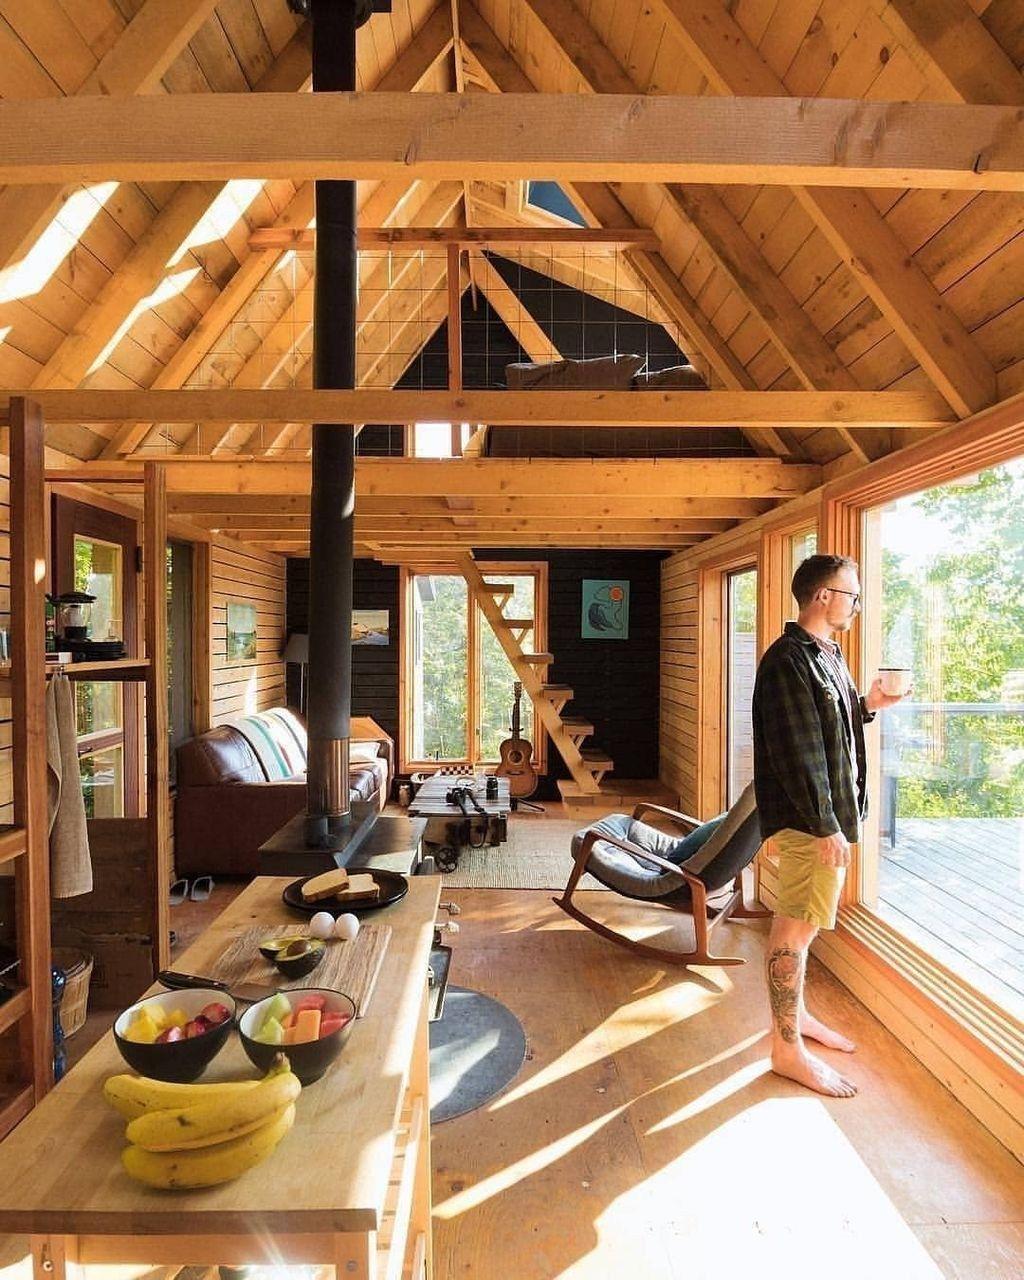 42 Awesome Tiny House Ideas #tinyhouses